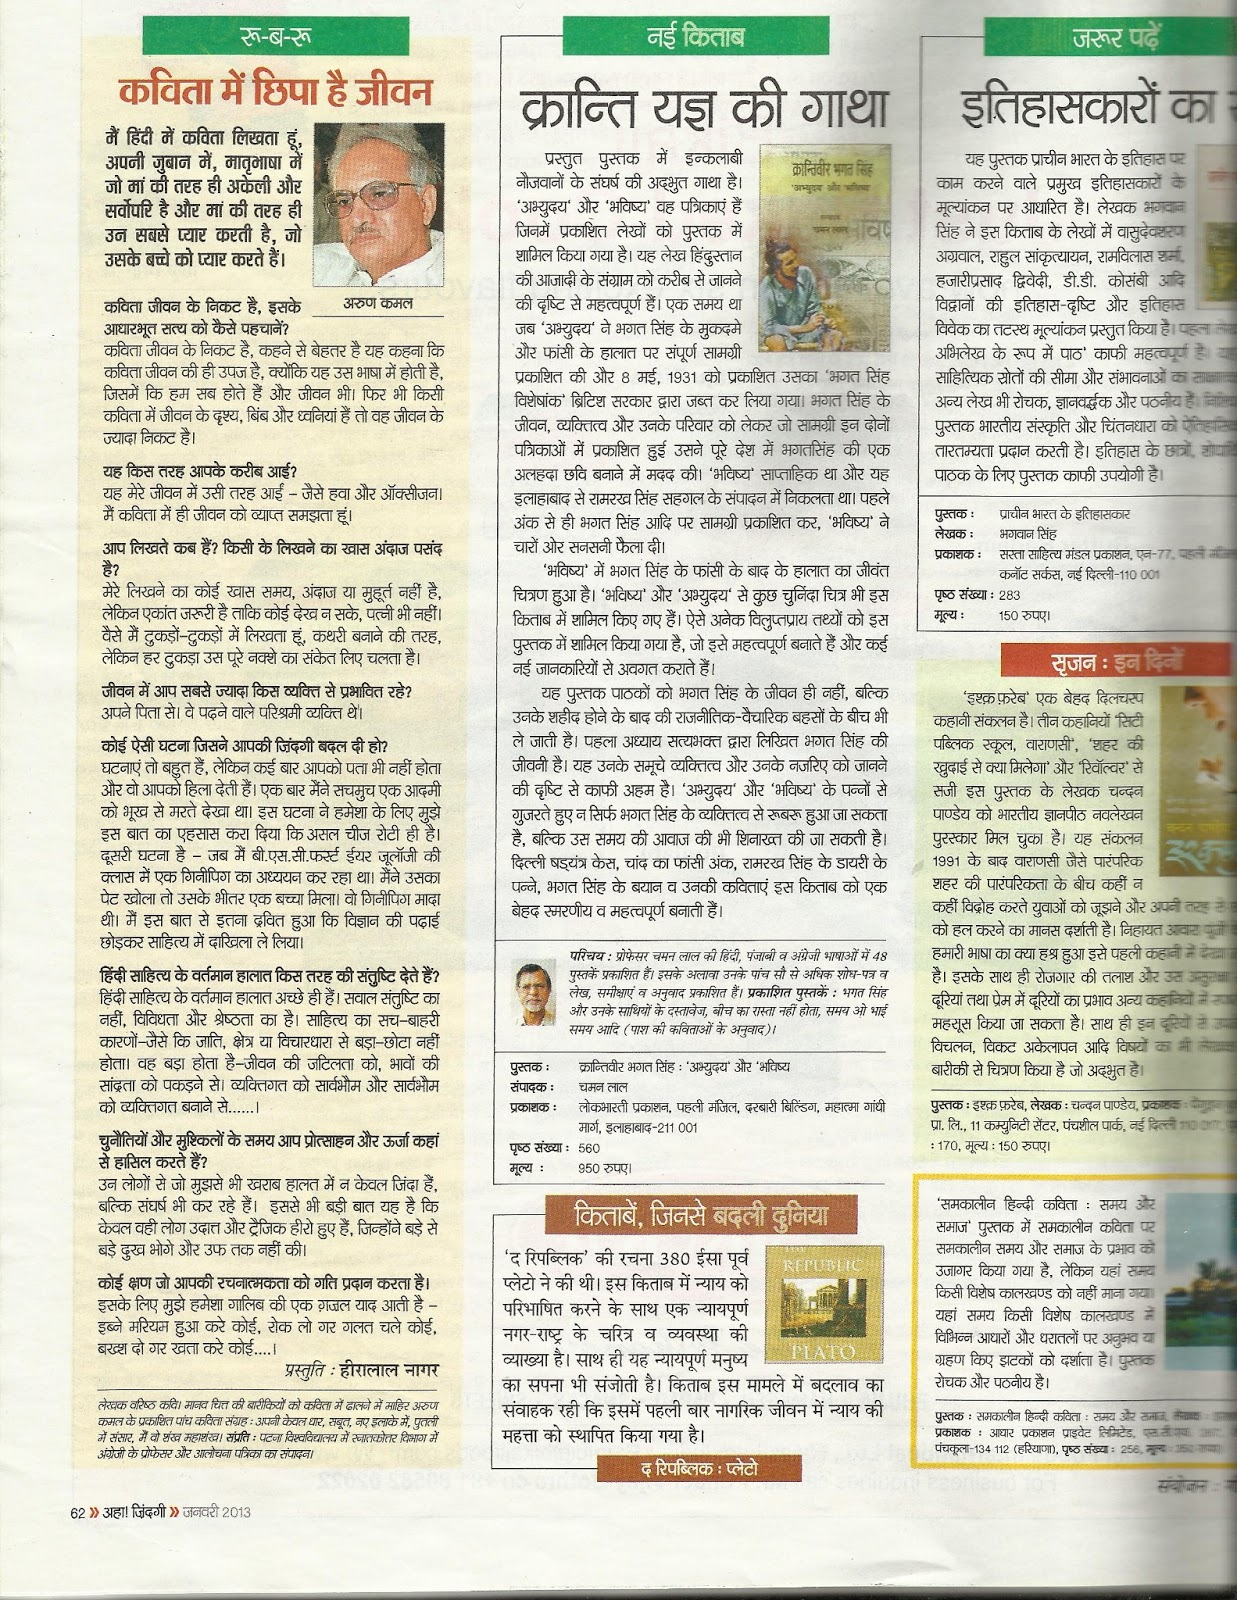 essay on bhagat singh bhagat singh short speech essay article d  bhagat singh study chaman lal review of krantiveer bhagat singh review of krantiveer bhagat singh in